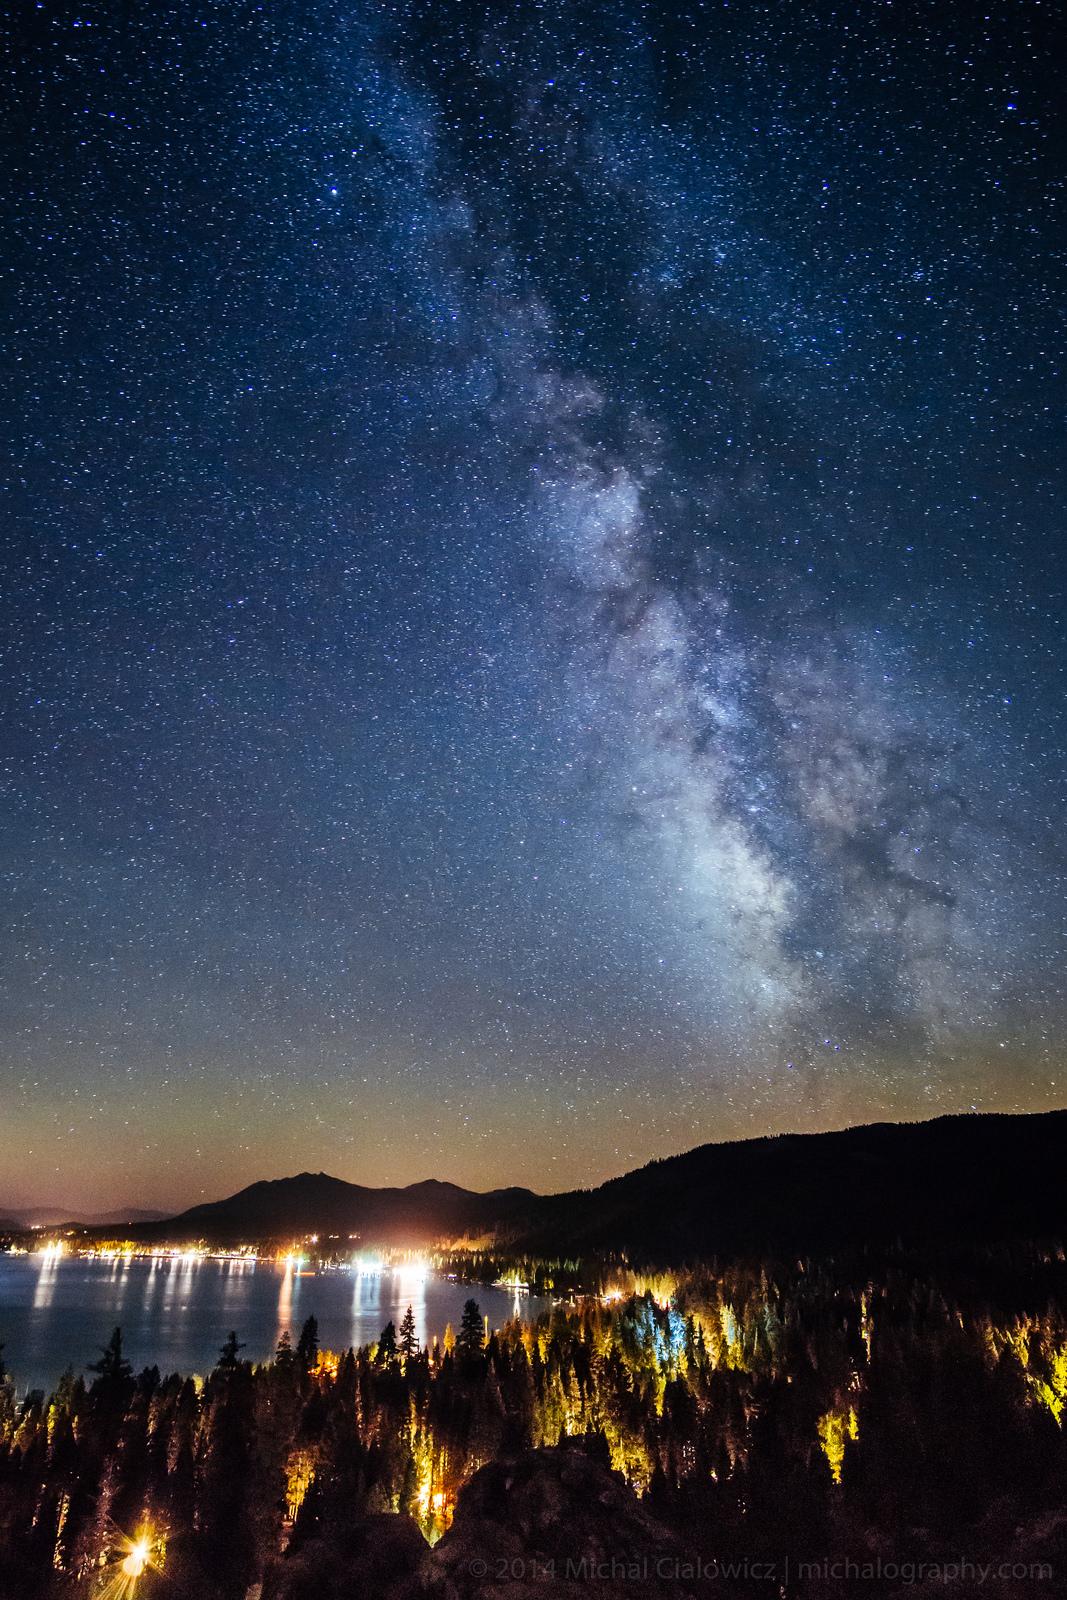 The Milky Way Above Tahoe (Sony A6000 + Rokinon 12mm f/2.0)